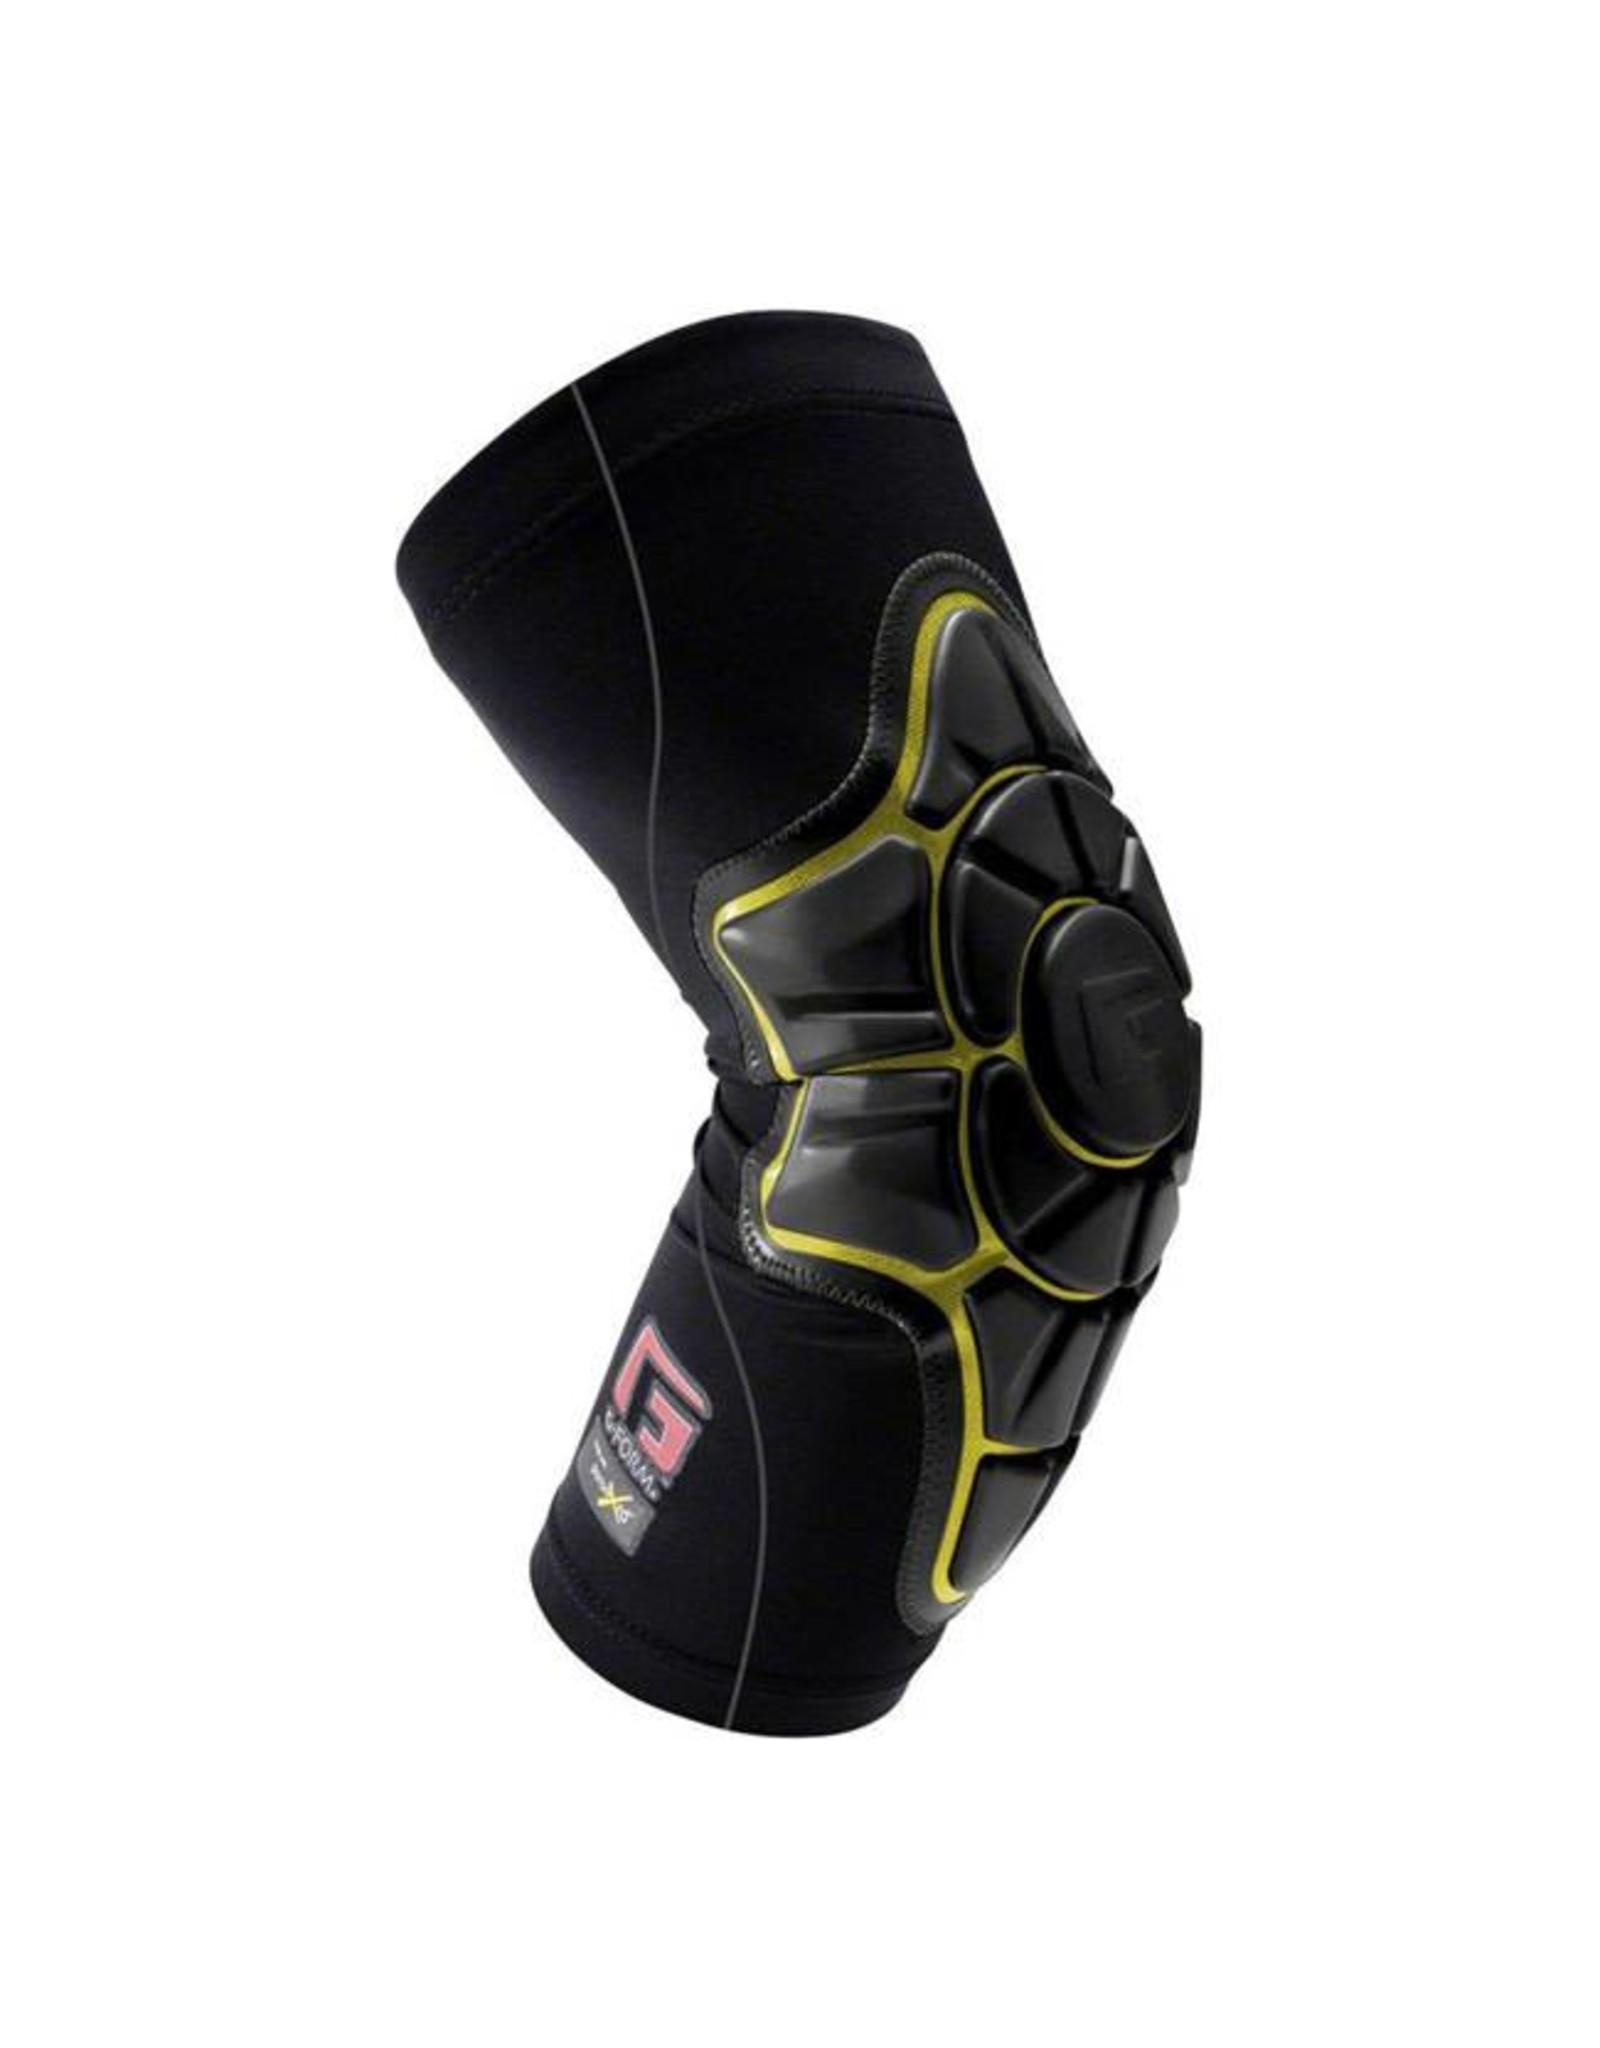 G-Form G-Form Pro-X Elbow Pad: Black/Yellow XS